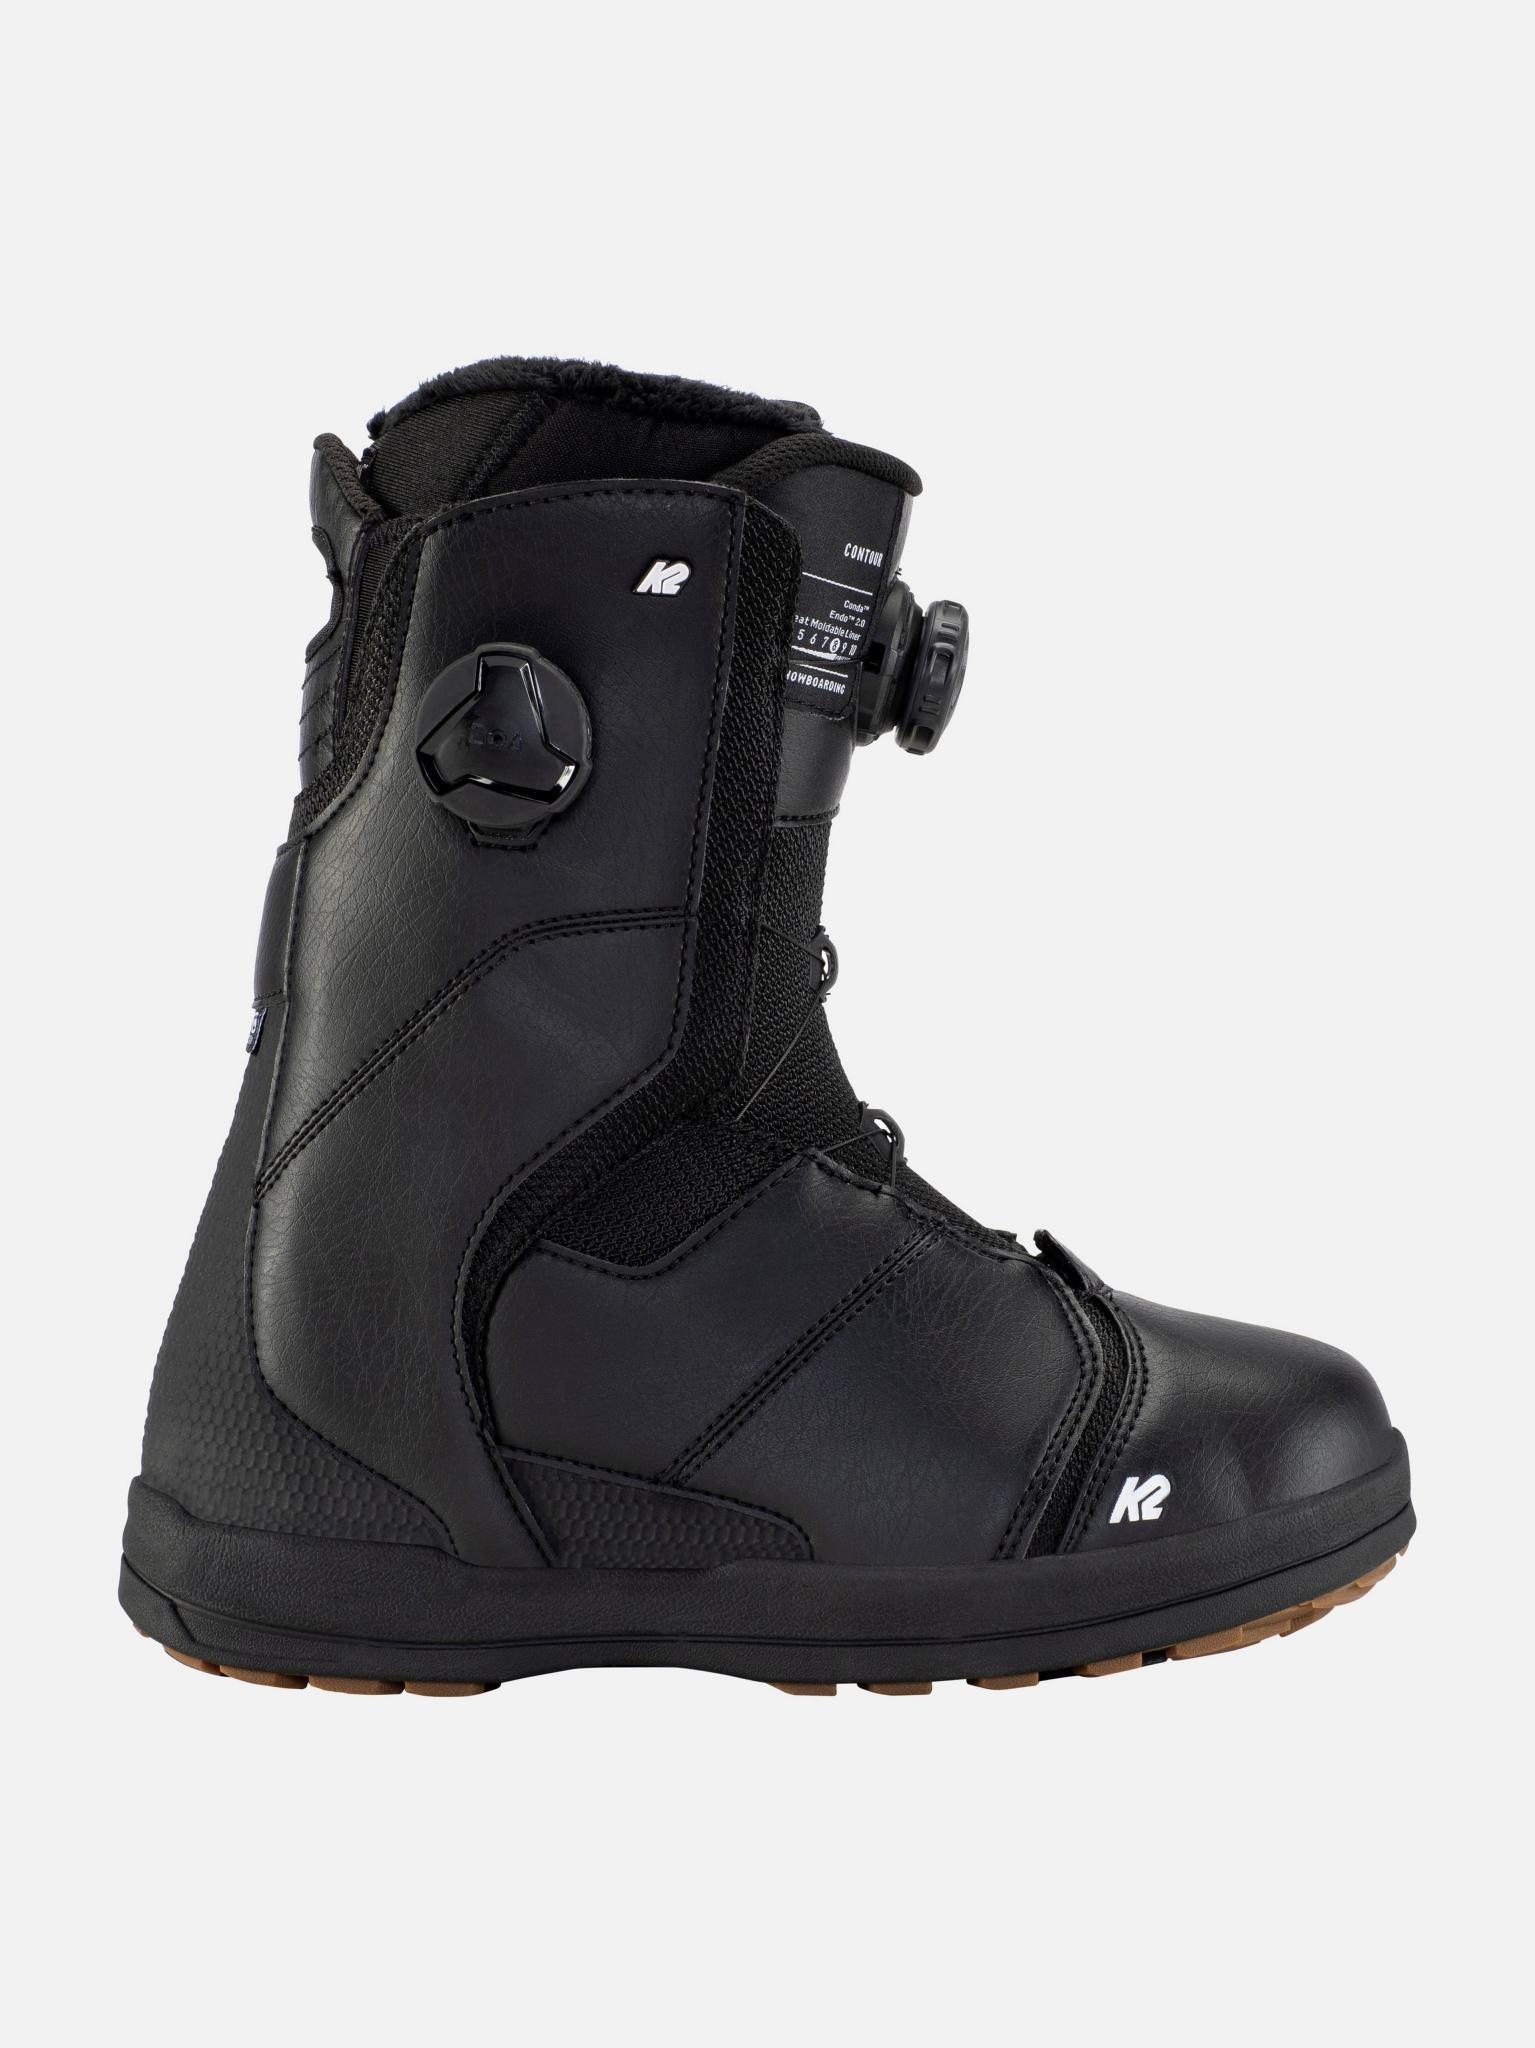 K2 K2 Women's Contour Snowboard Boot